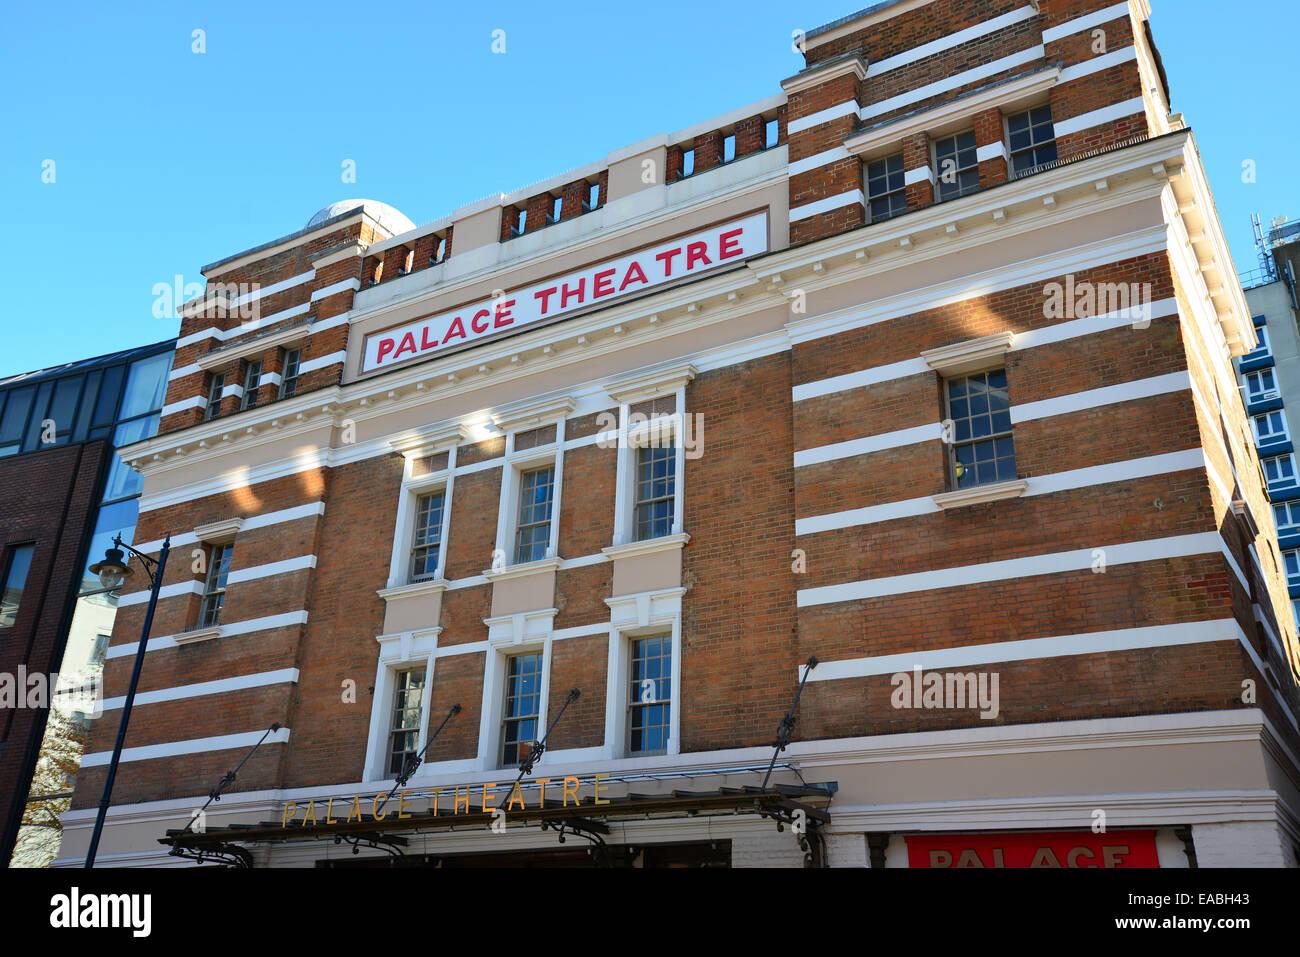 Watford Palace Theatre, Clarendon Road, Watford, Hertfordshire, England, United Kingdom - Stock Image